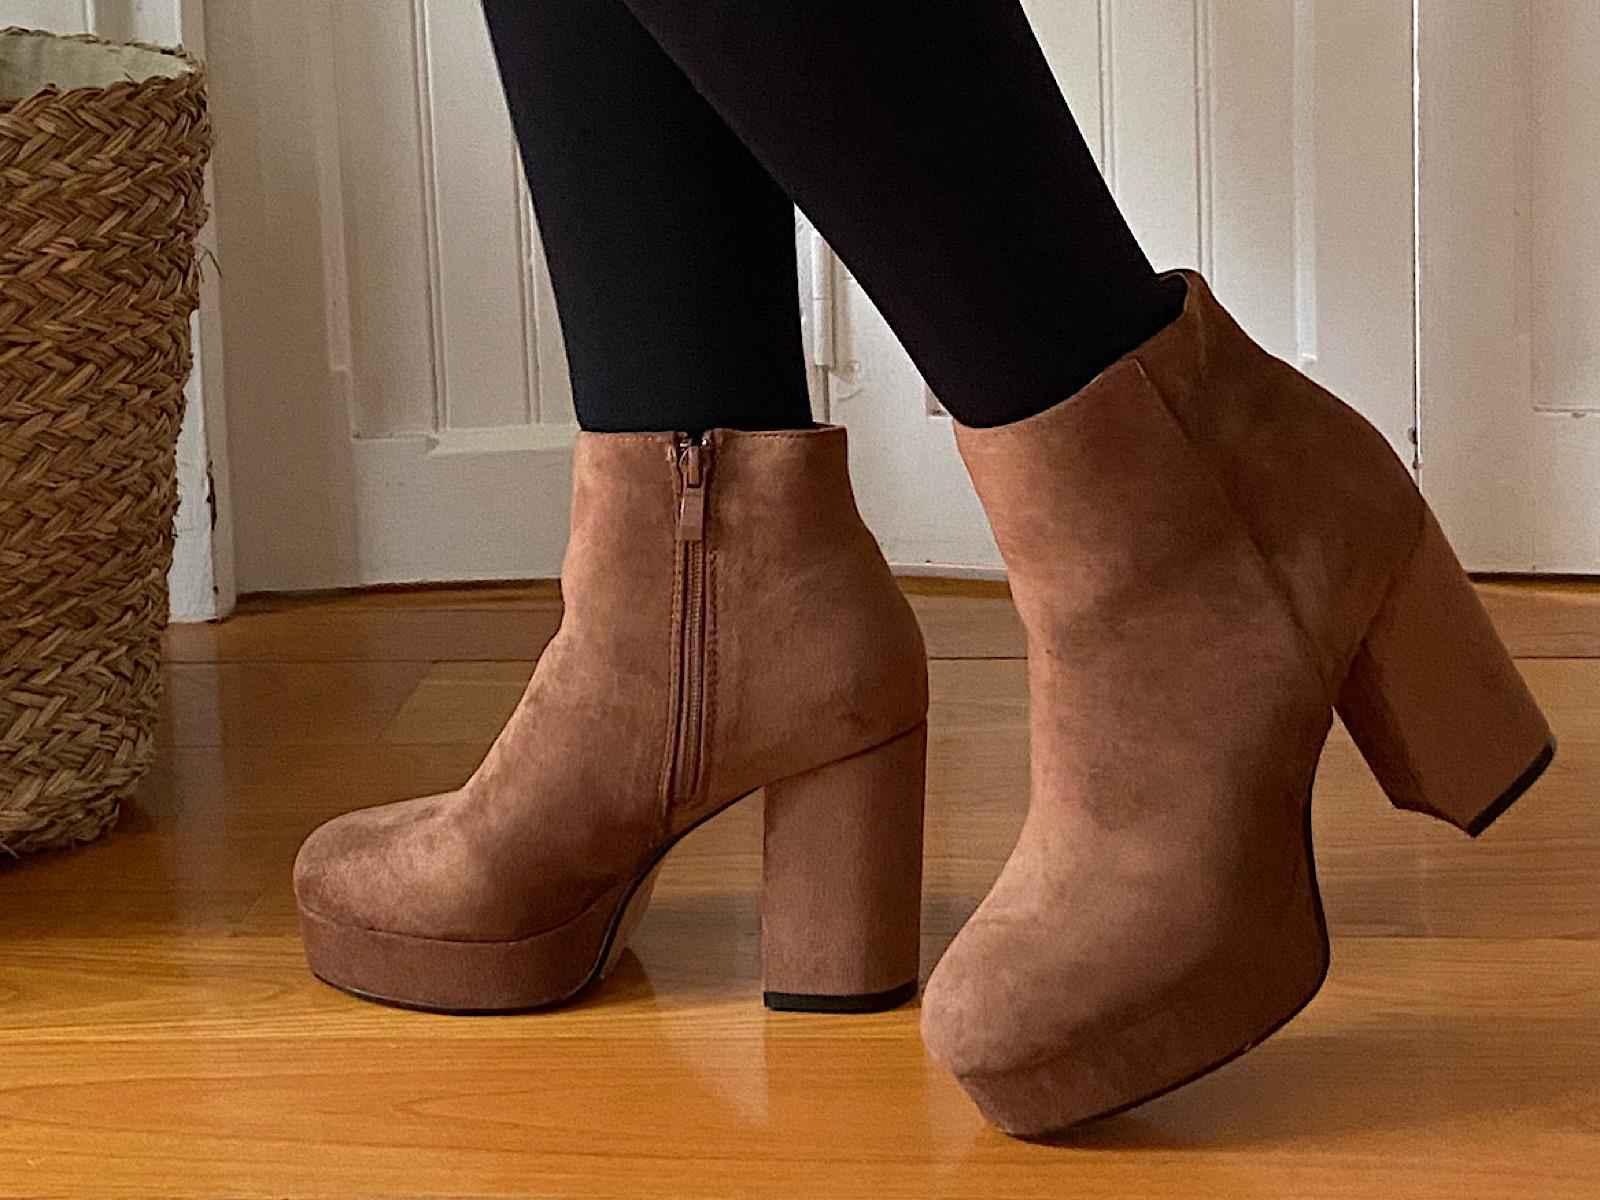 Hoy va de zapatos!